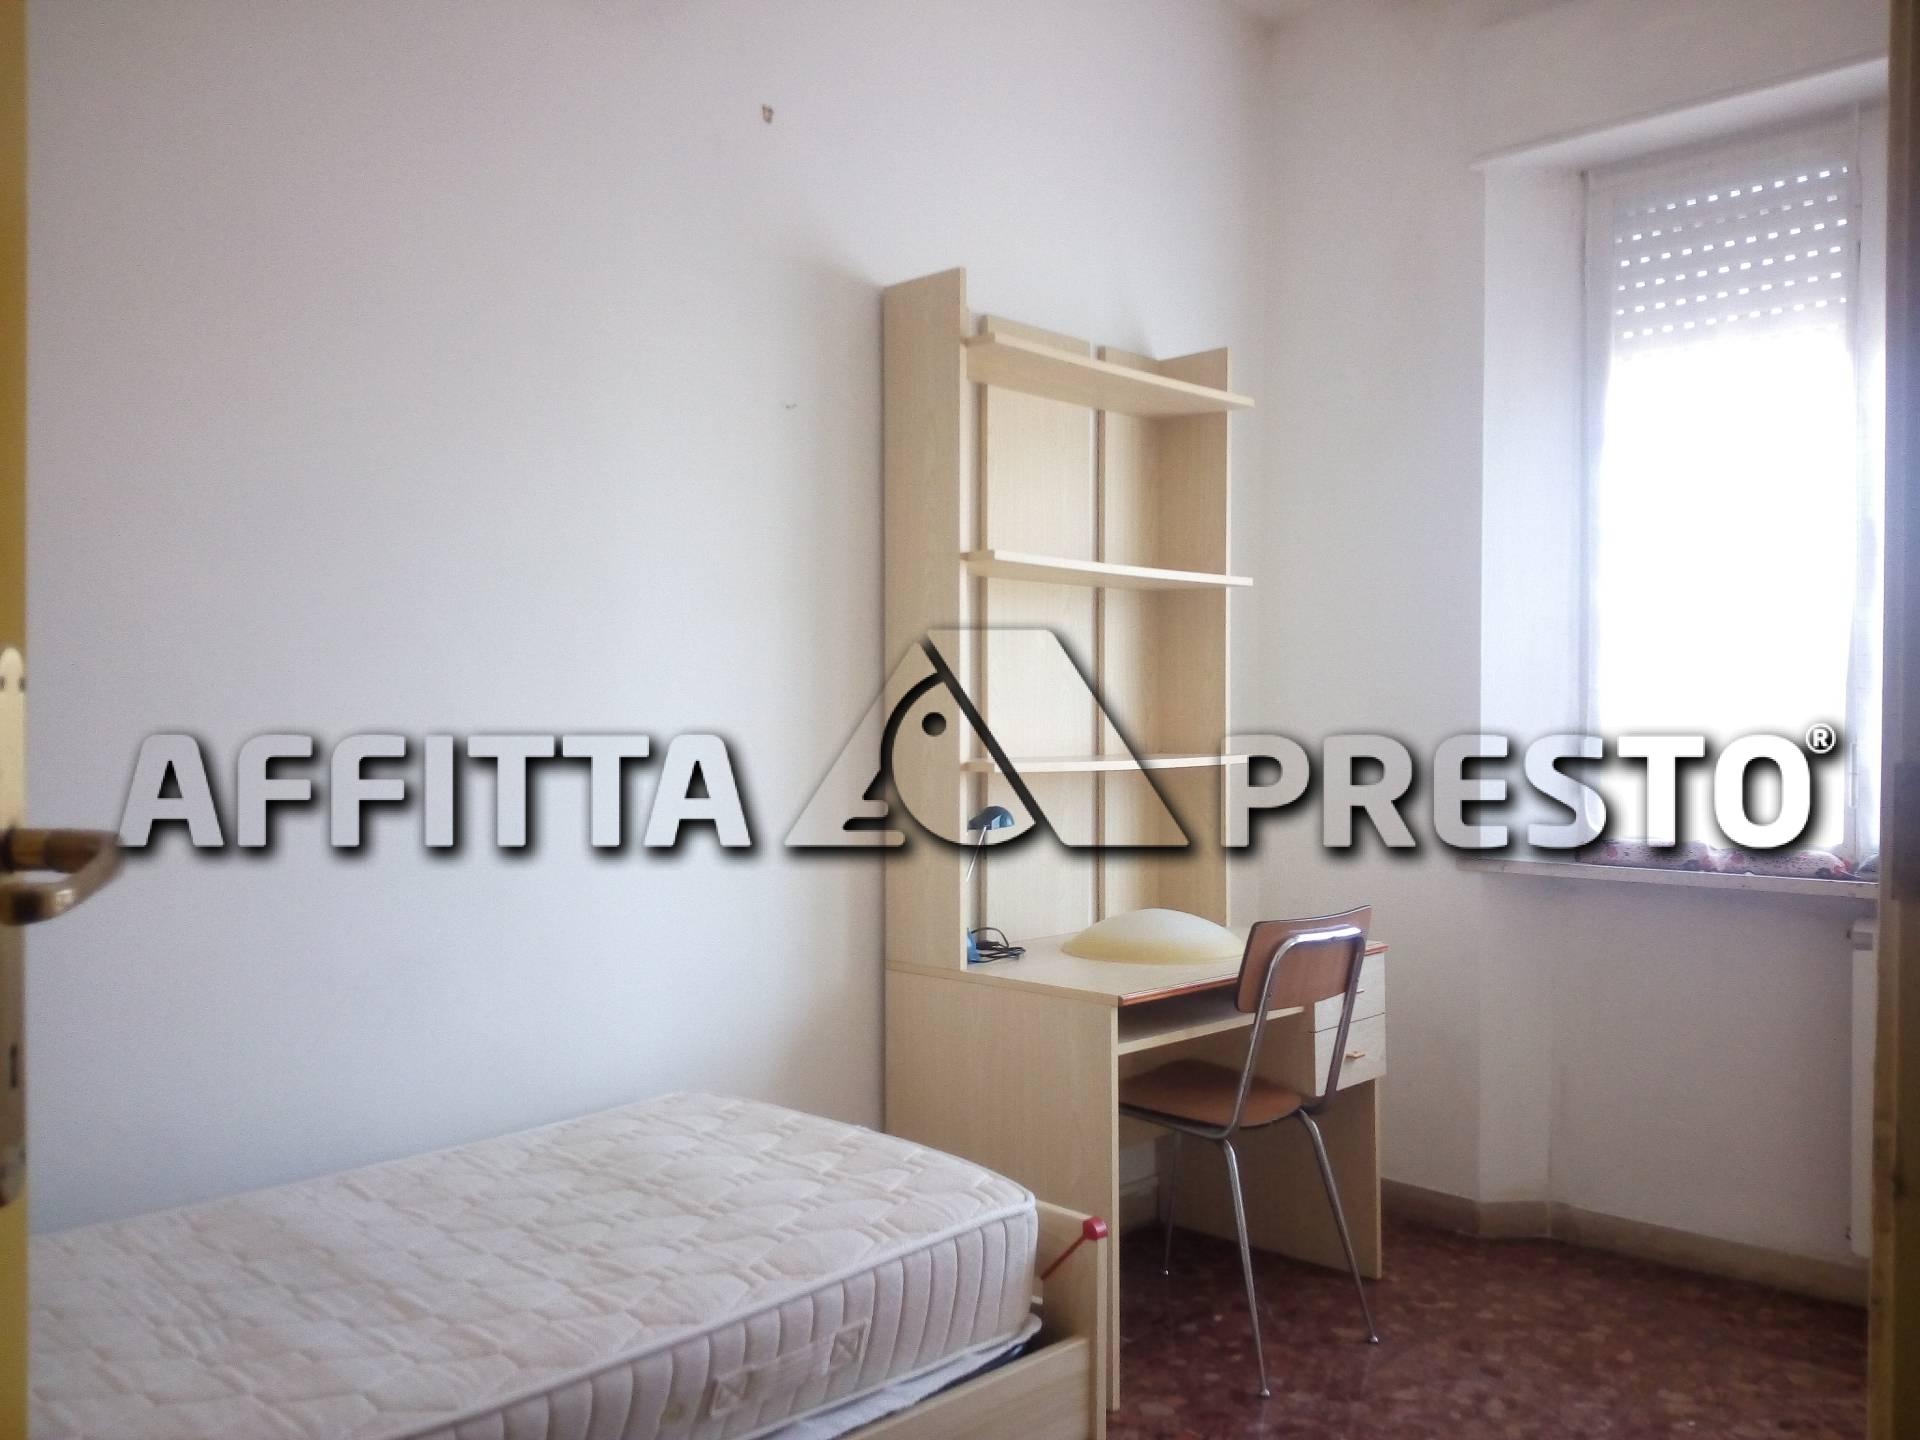 Porzione di casa in affitto a I Passi, Pisa